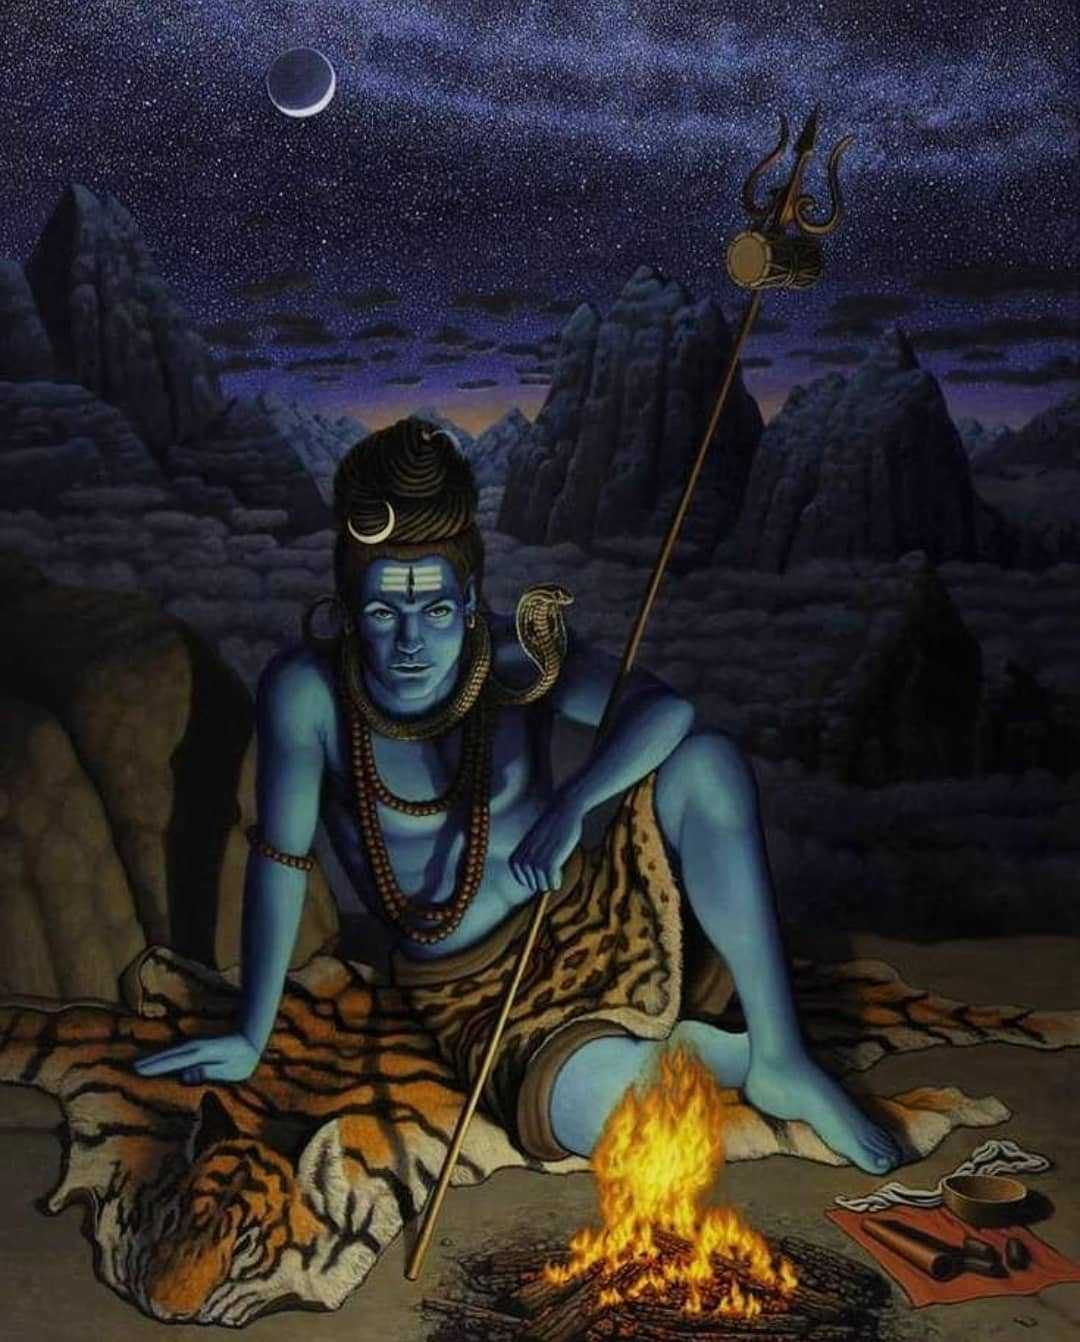 Horror Mahakal HD Wallpaper 1080p Download - We are share best mahakal god whatsapp dp images wallpaper. Download best jai mahakal damru wale ki hd quality images new.